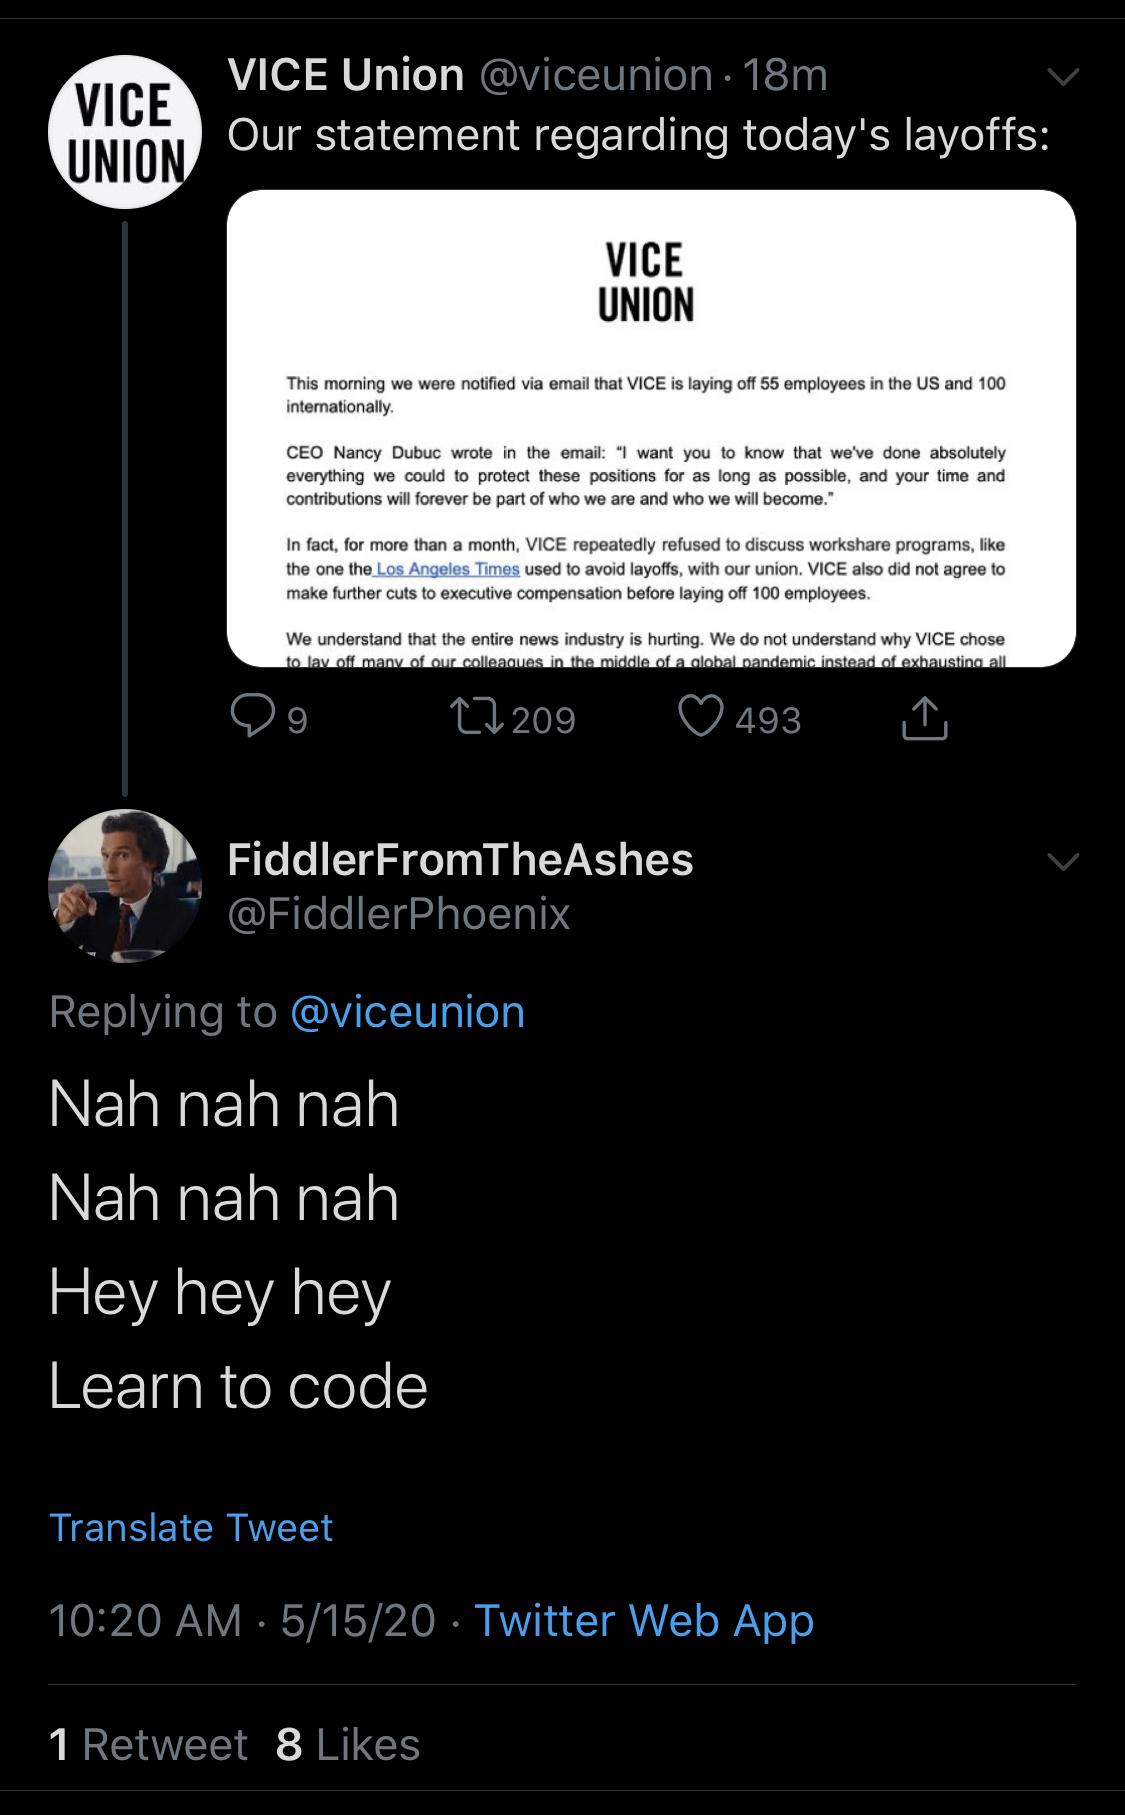 vicelearntocode